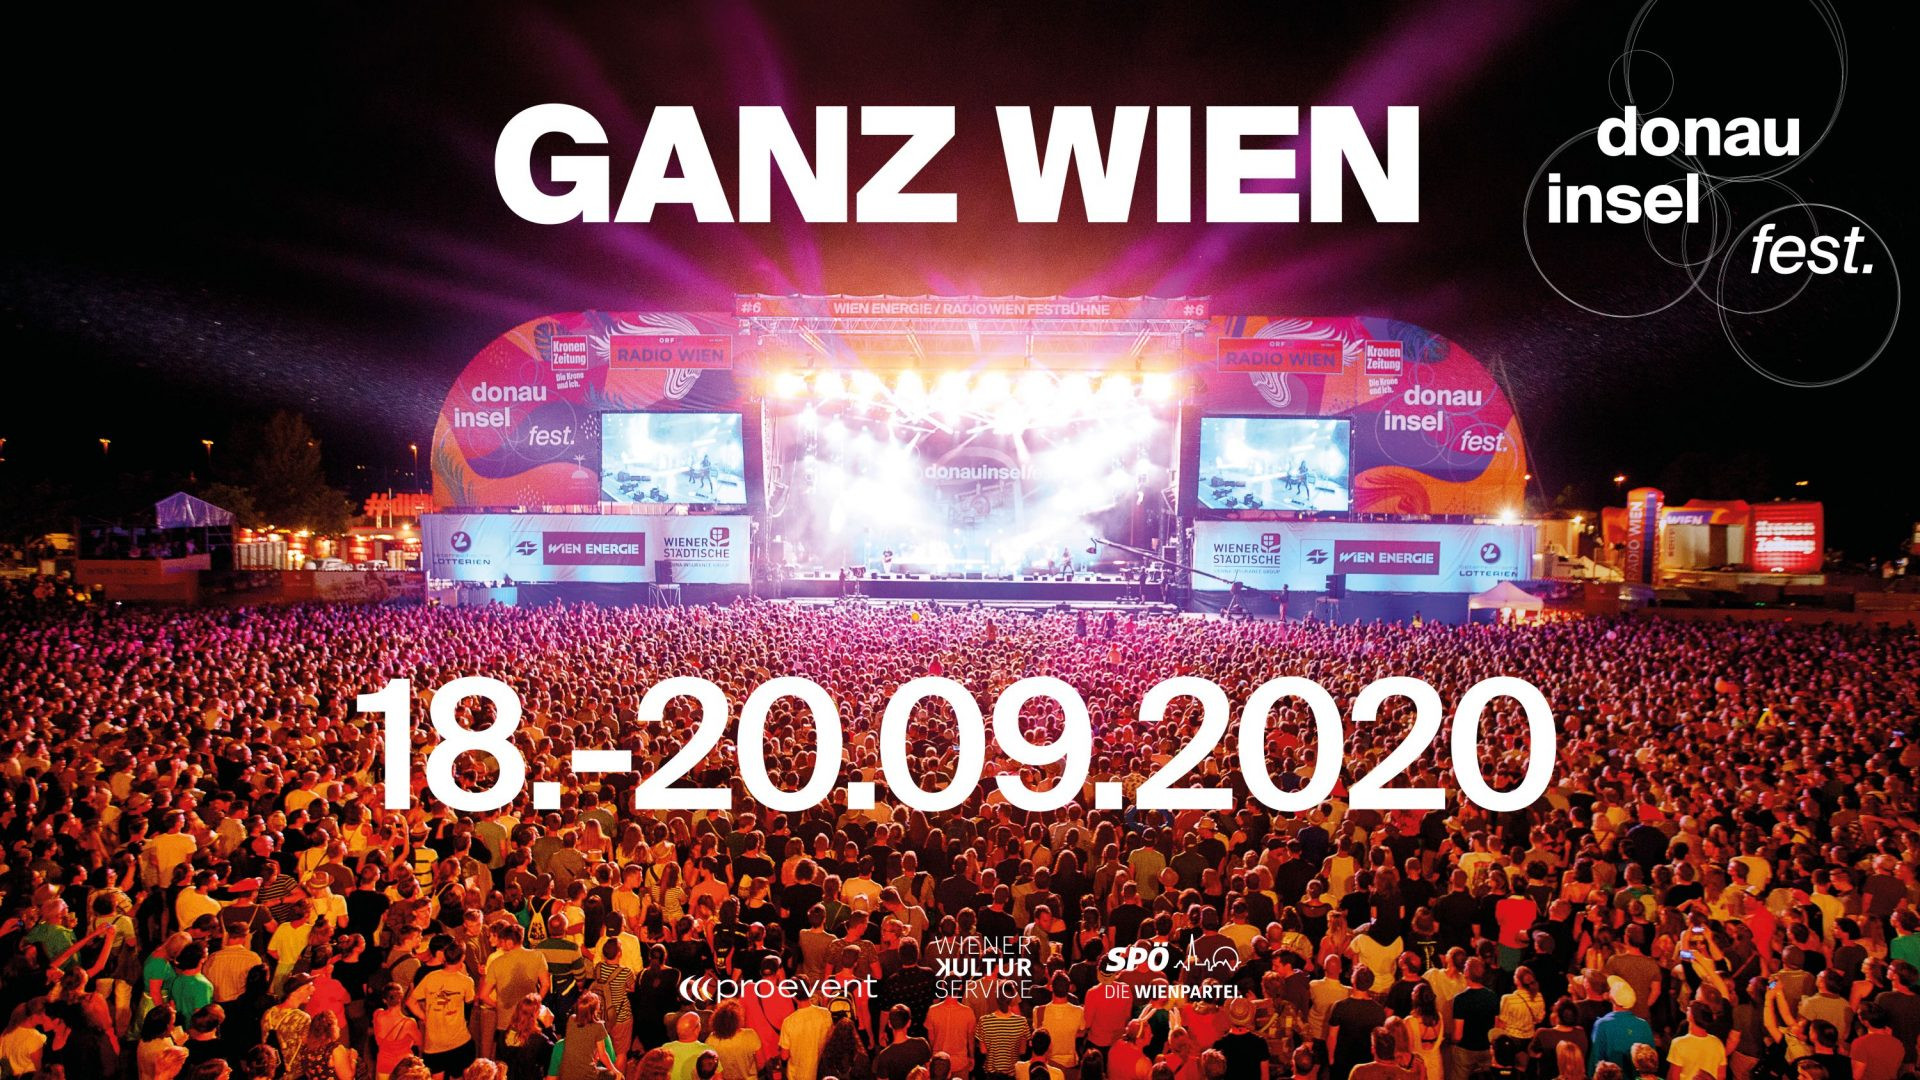 Donauinselfest 2020 Donauinsel Wien 18 09 2020 Volume Events